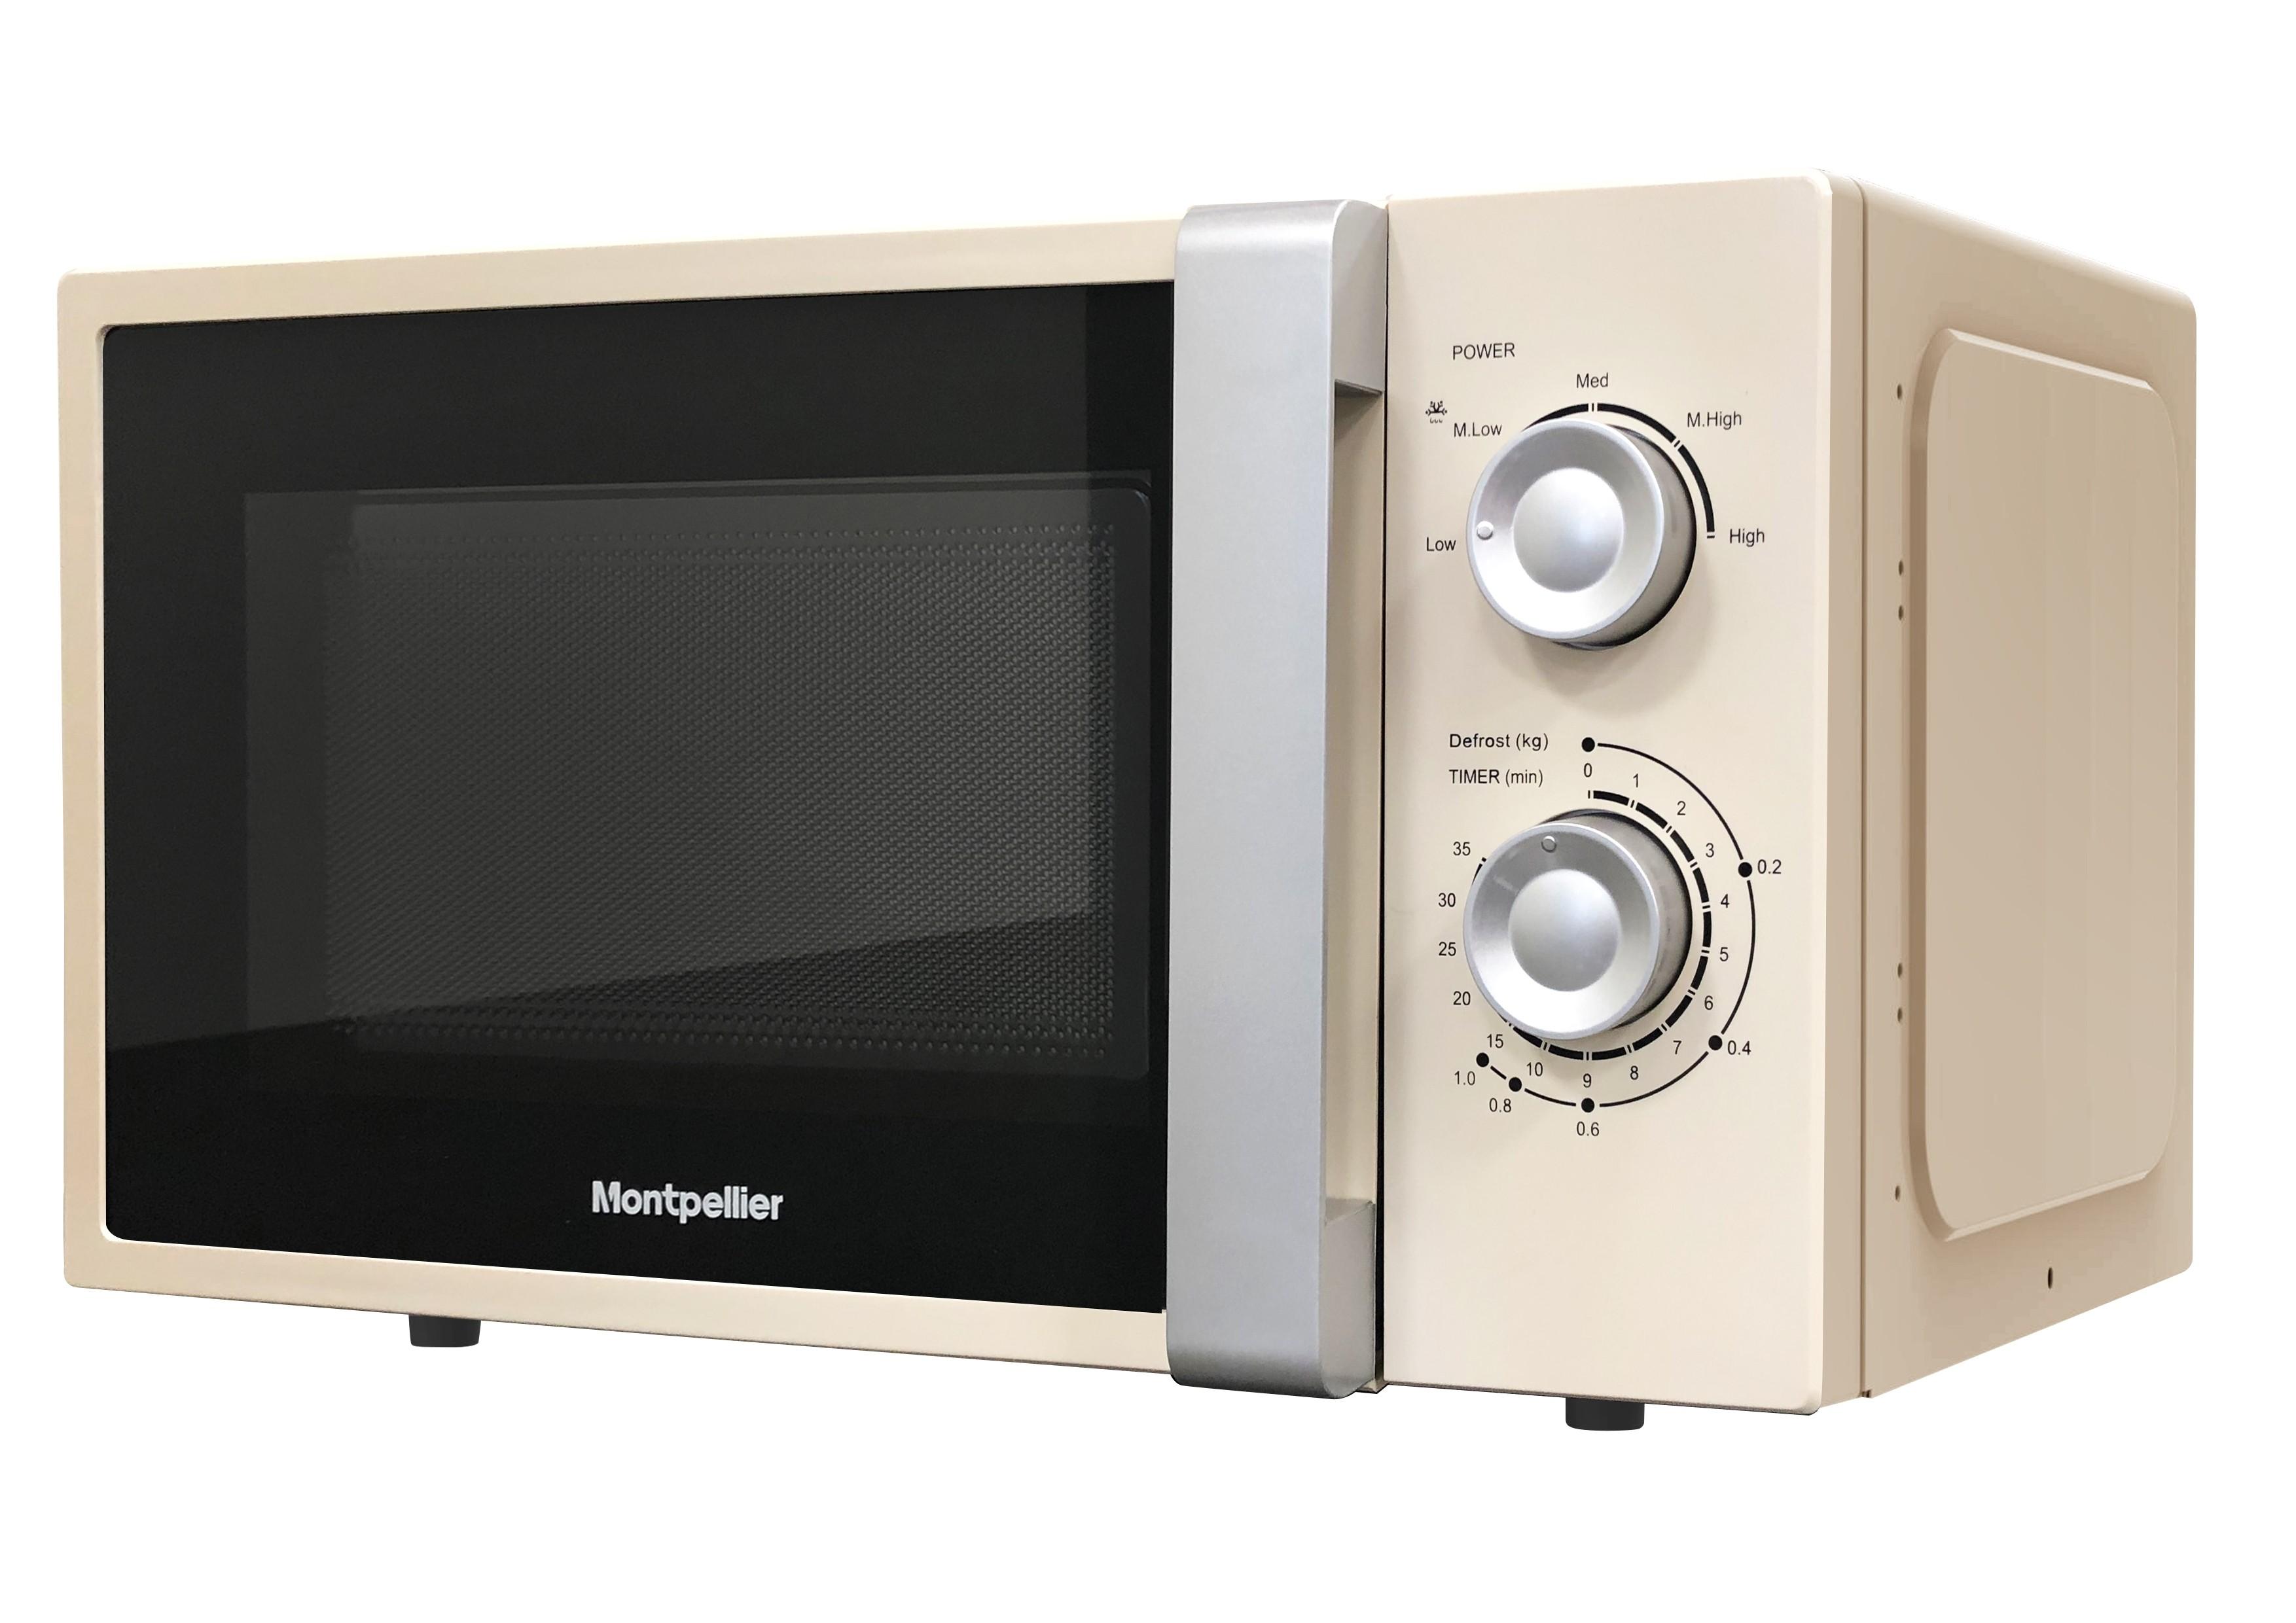 Montpellier MOR20C Microwave